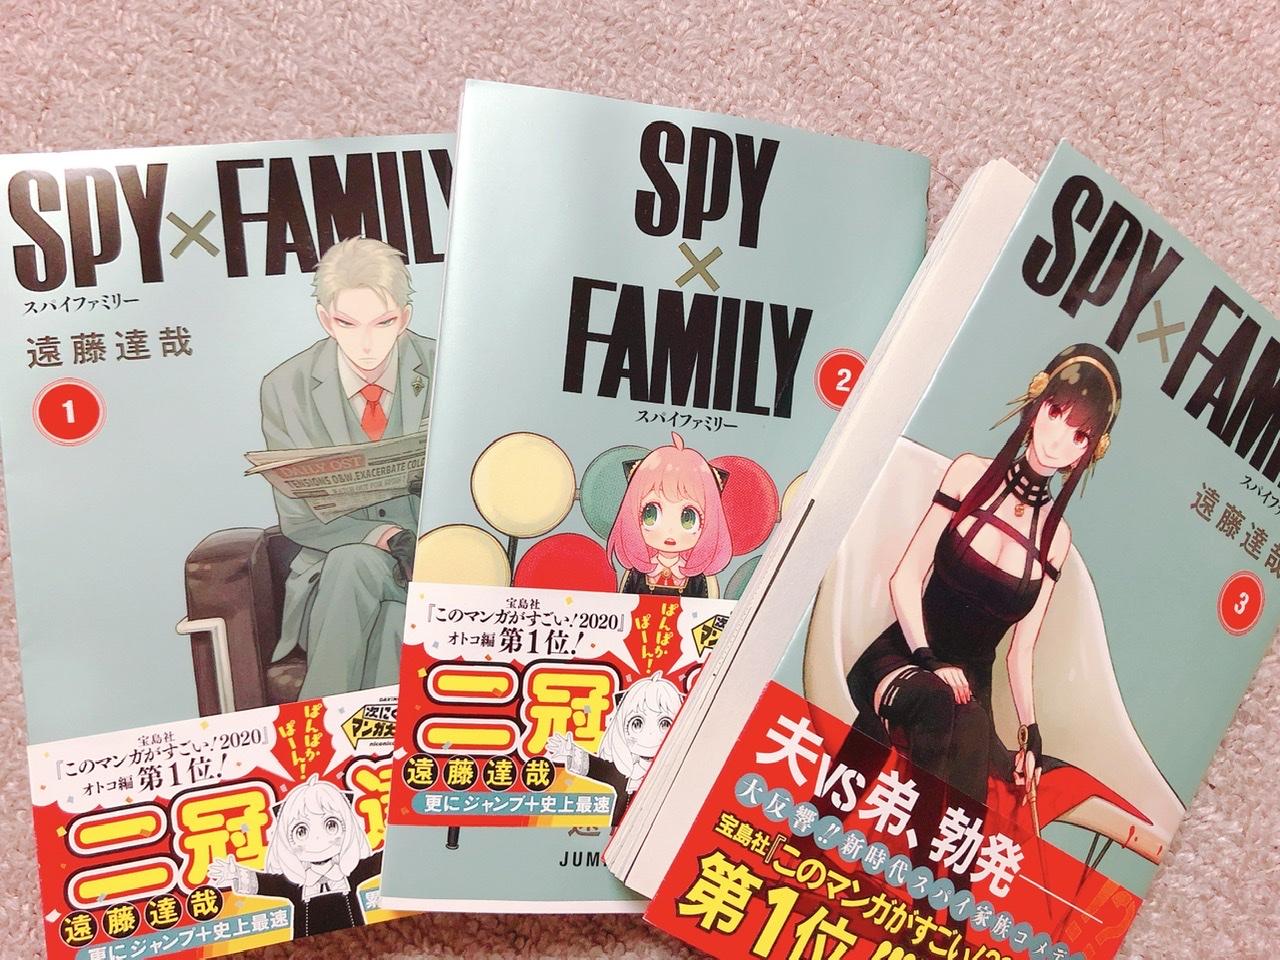 「「SPY×FAMILY(スパイファミリー)」は、どんな話?人気漫画のあらすじはこちら」のアイキャッチ画像